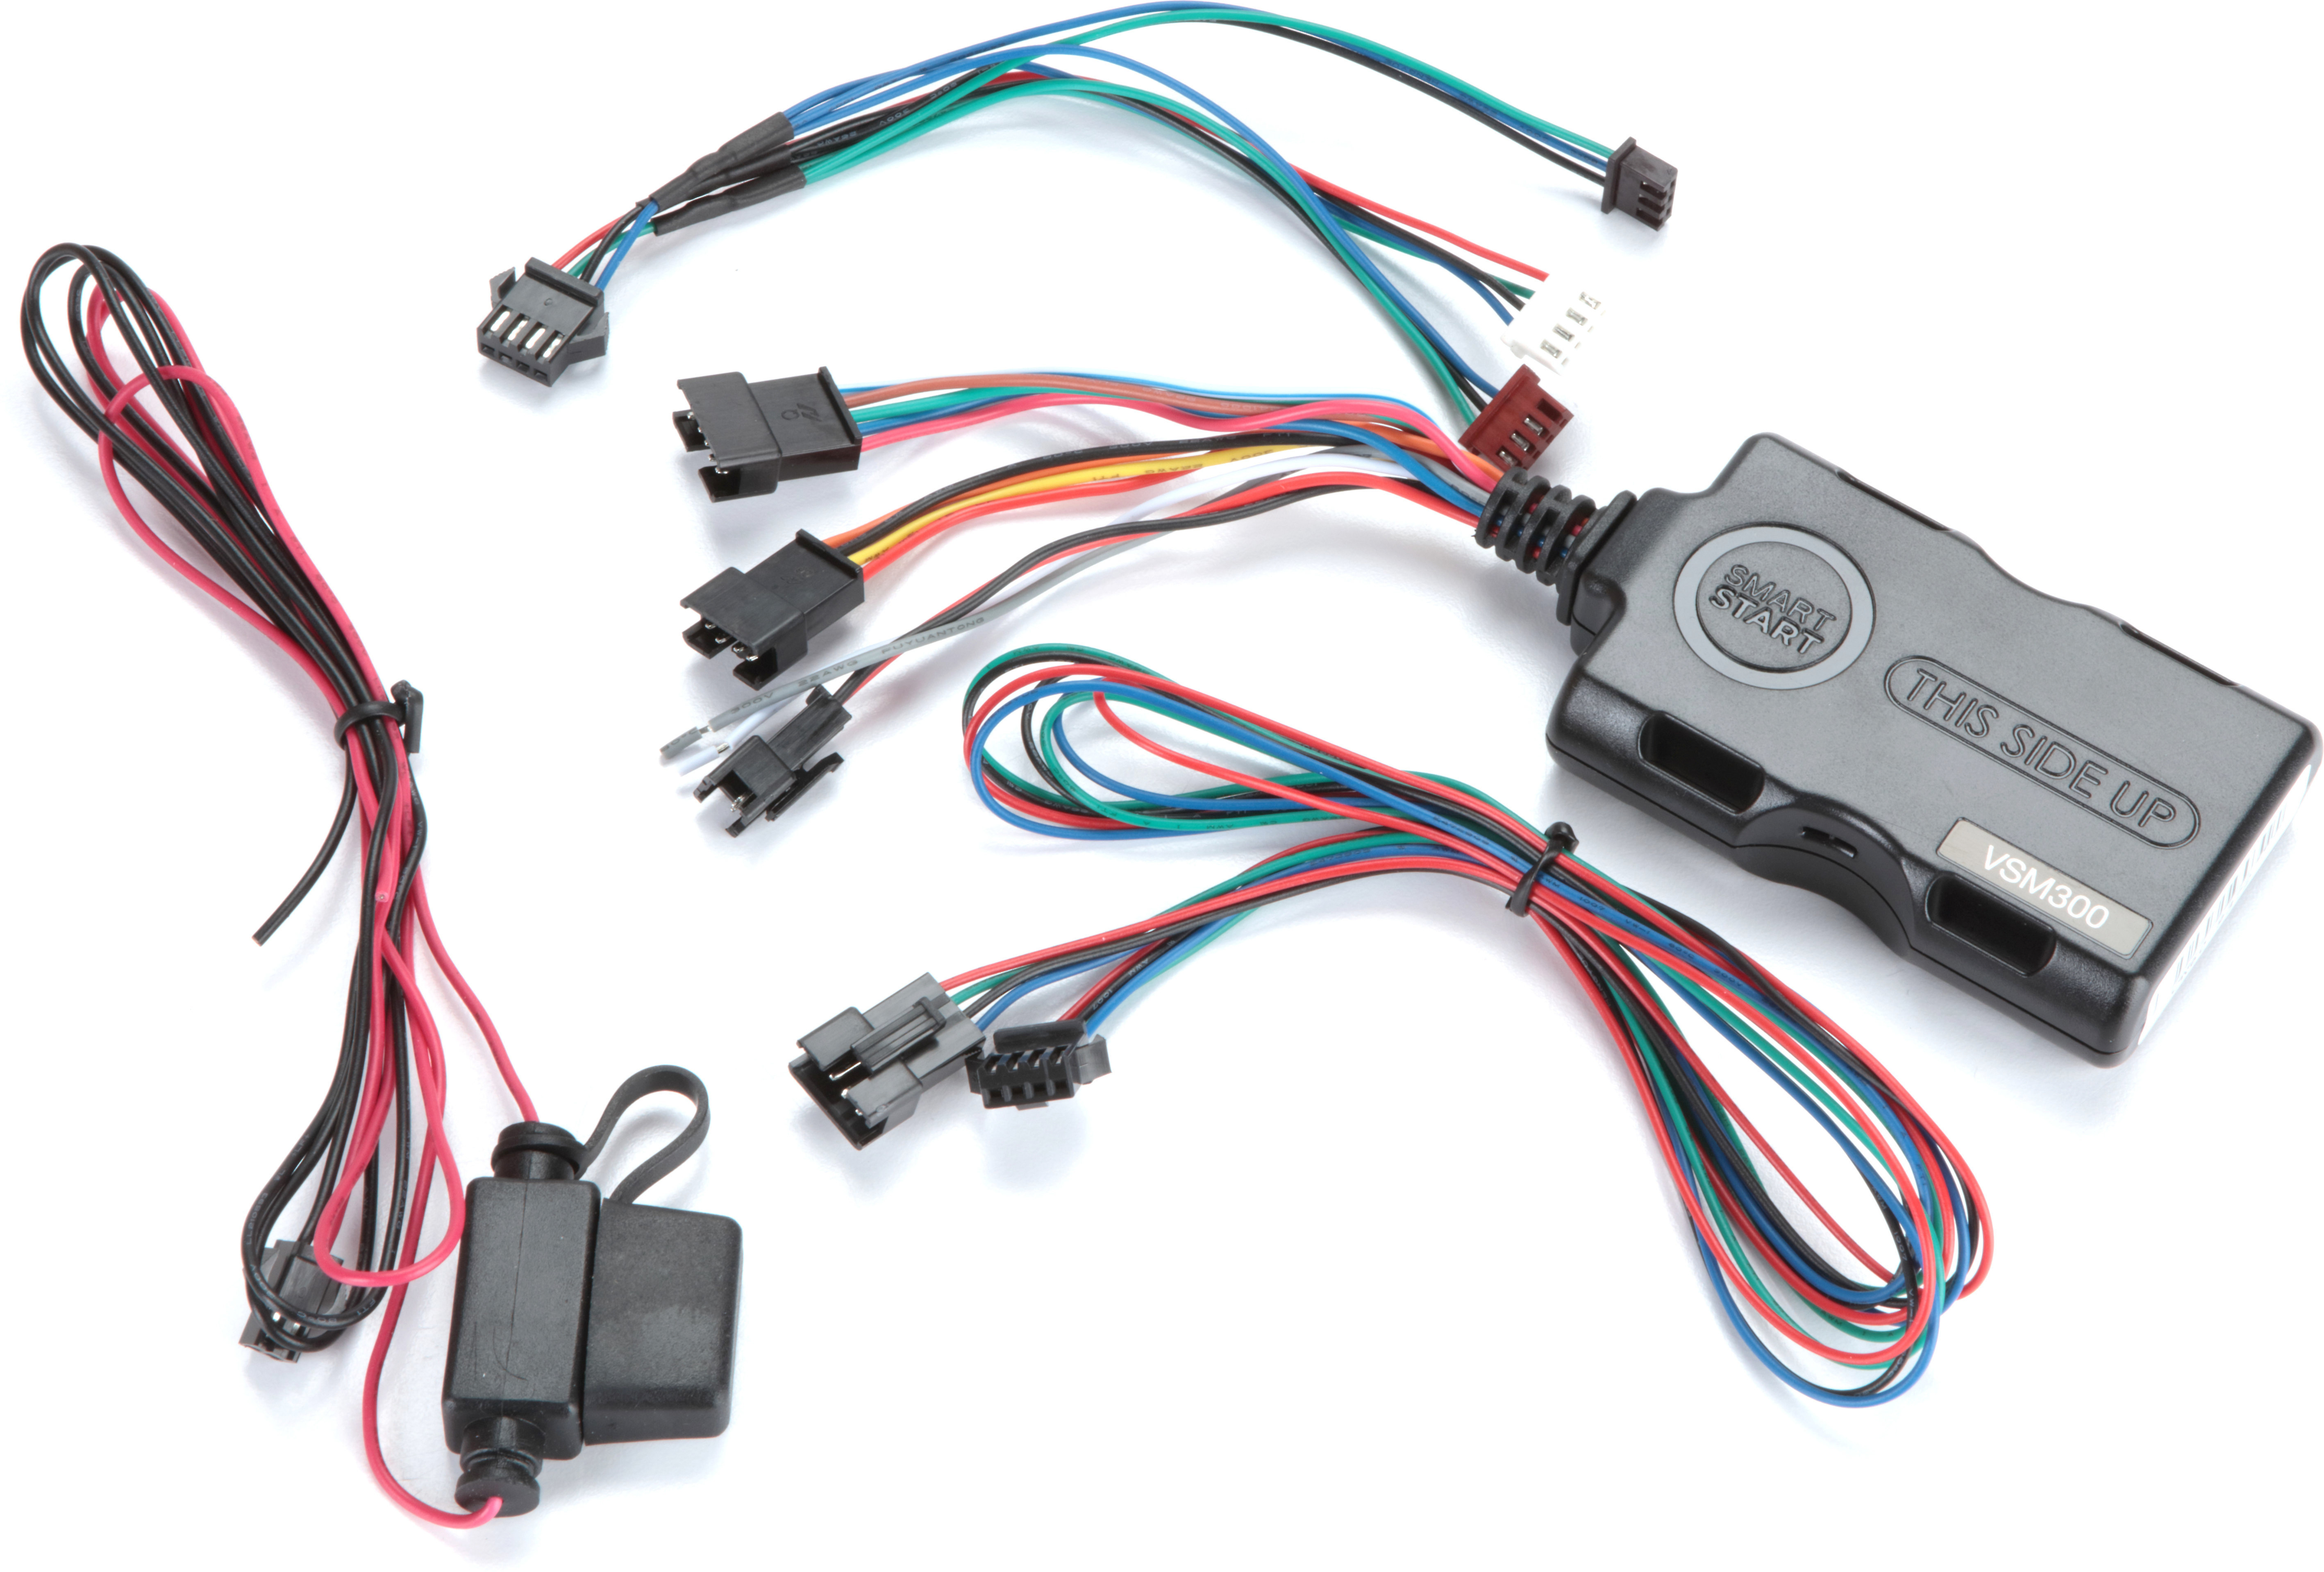 viper remote starter wiring diagram viper vsm300 smartstart module connects your smartphone or  viper vsm300 smartstart module connects